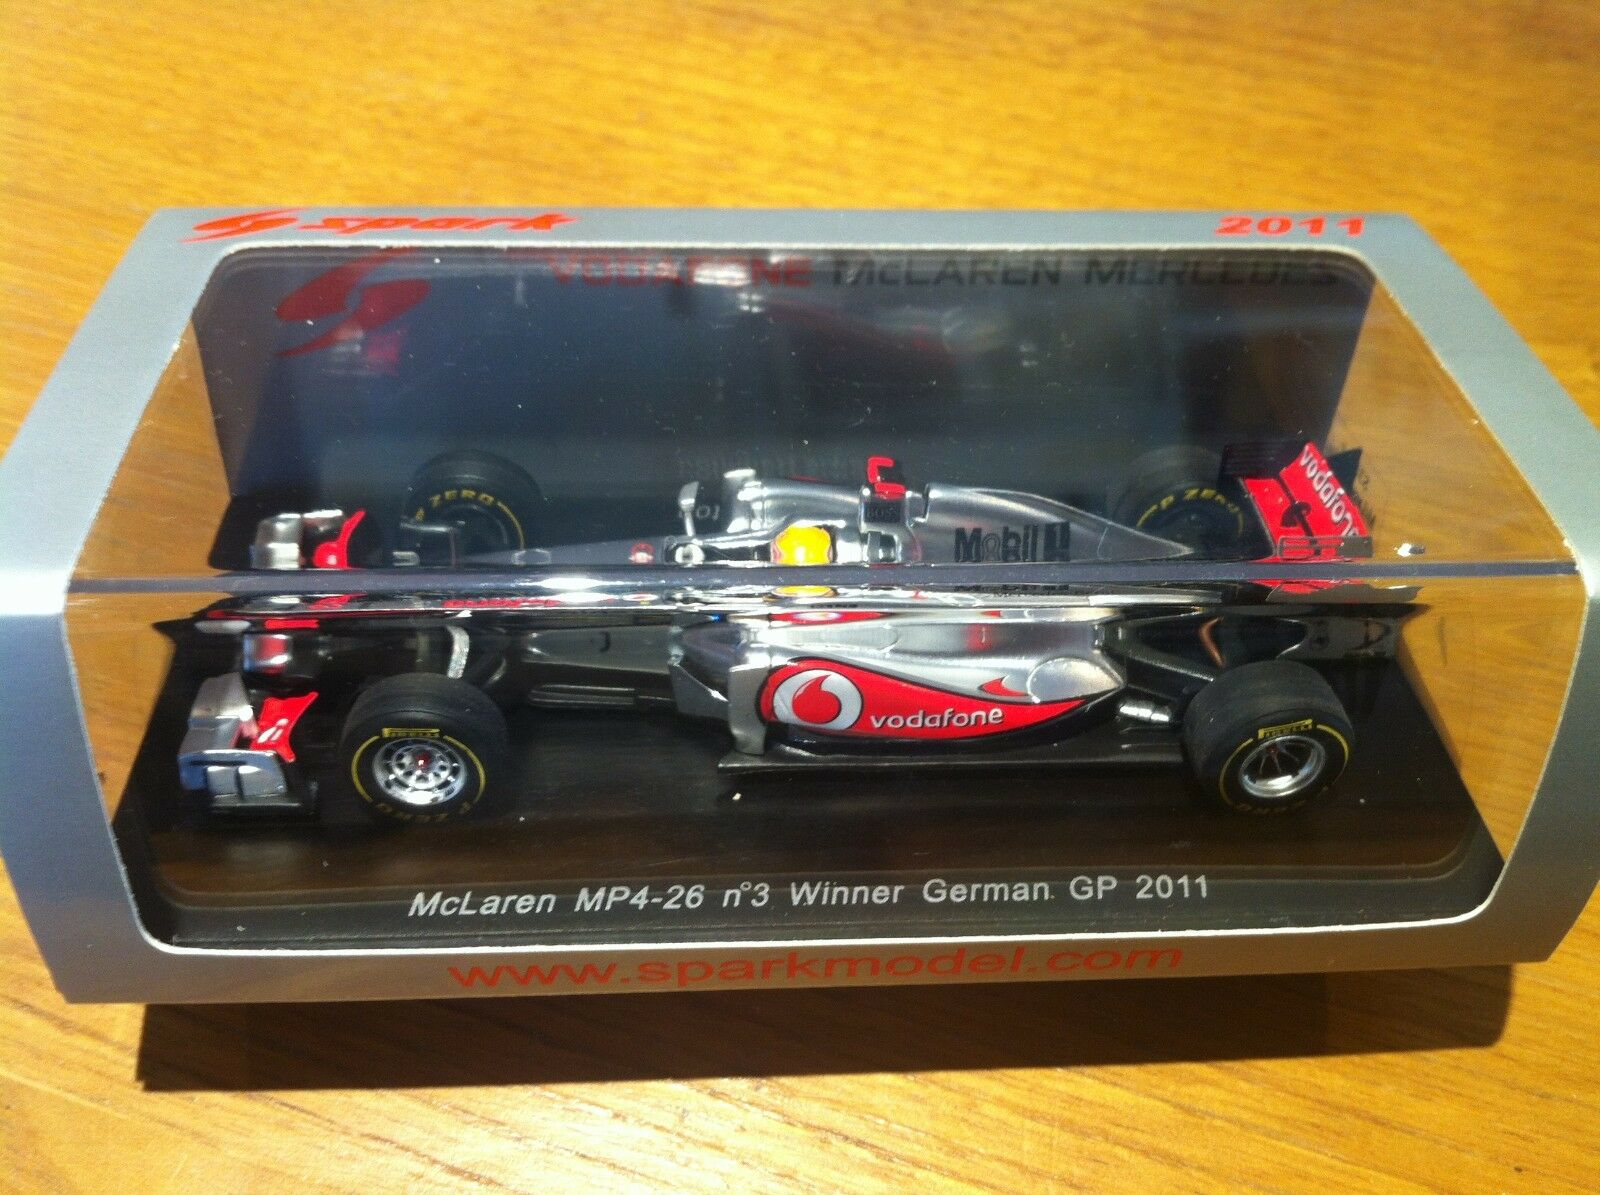 Spark Mc Laren (McLaren) MP4-26 Hamilton Allemagne German GP 1 43 S3030